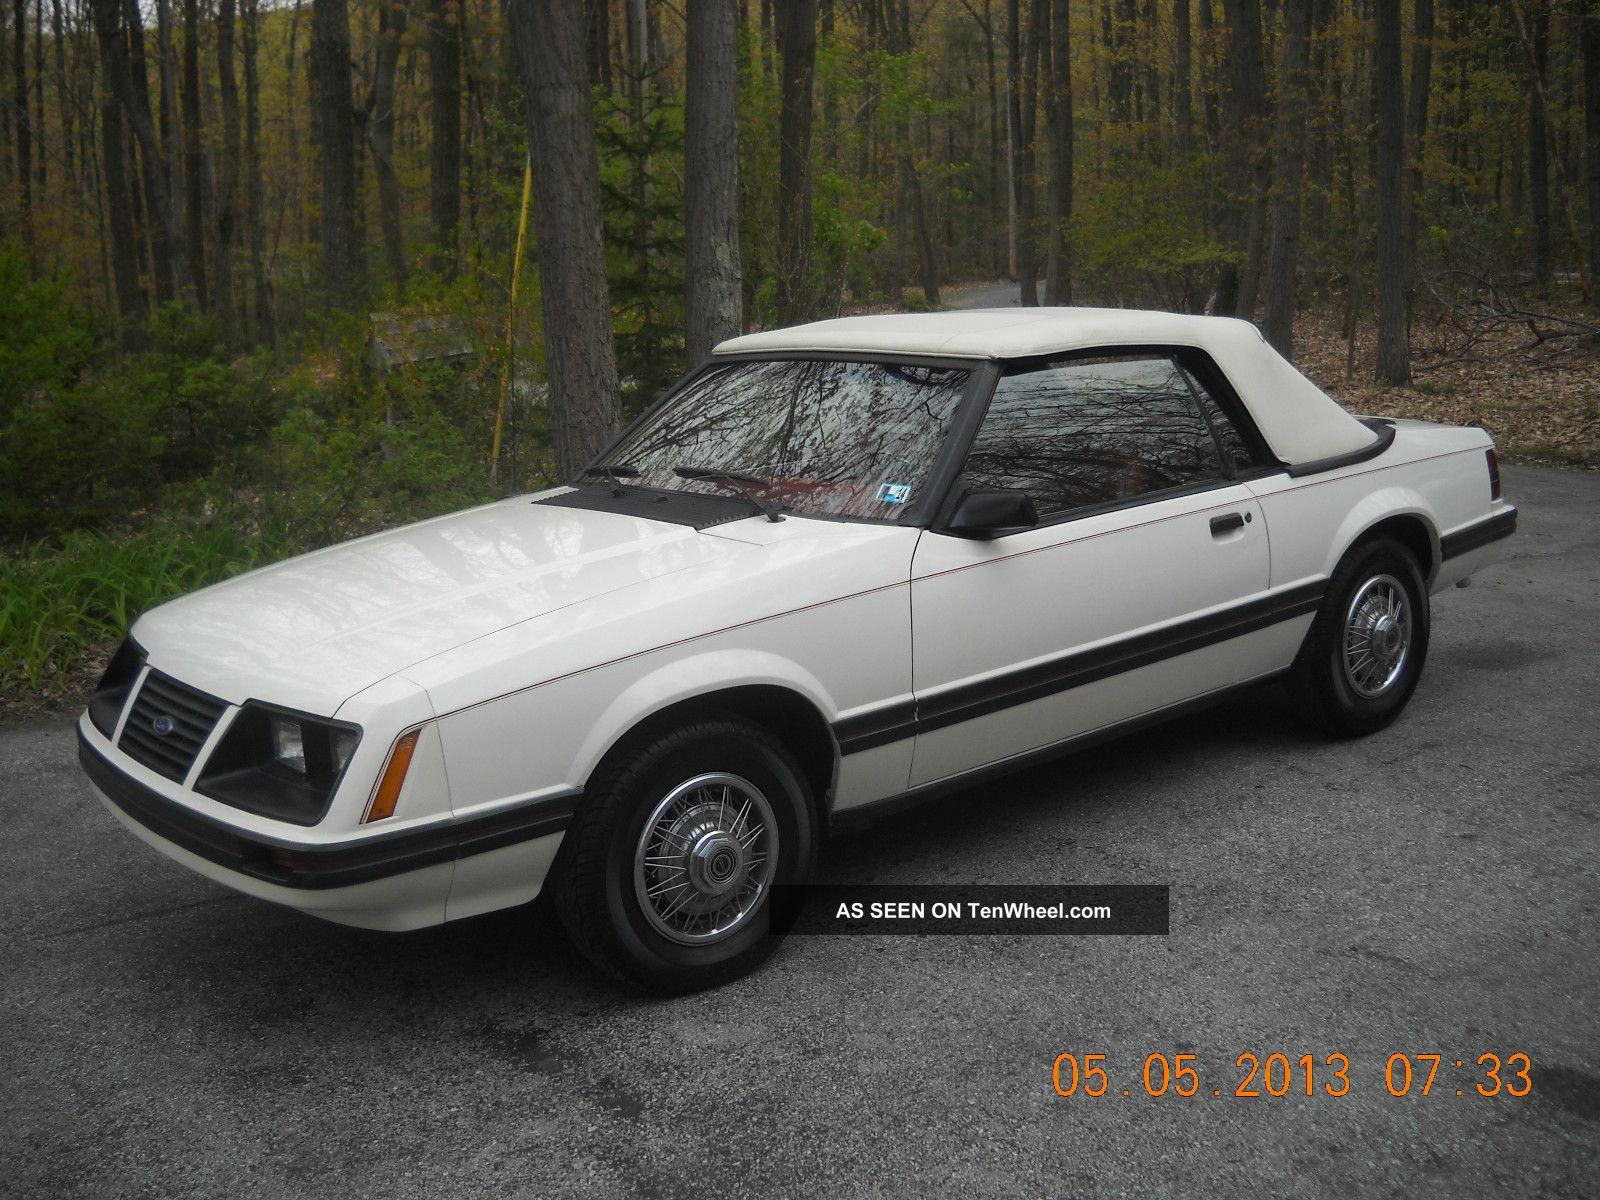 1983 ford mustang glx convertible 2 door 3 8 v 6. Black Bedroom Furniture Sets. Home Design Ideas